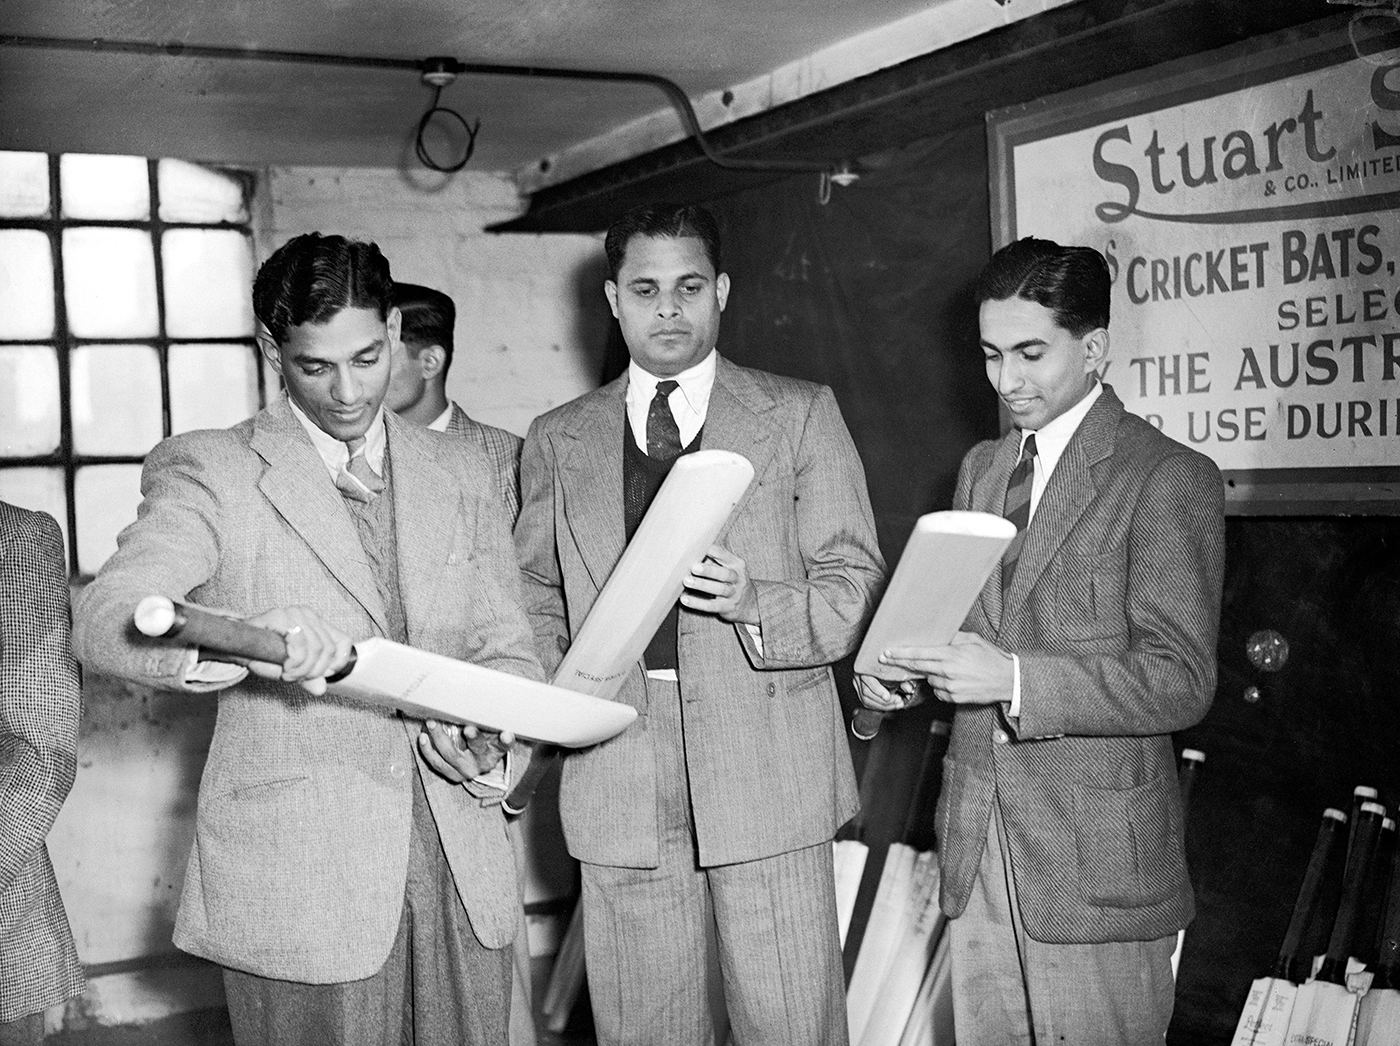 CS Nayudu, Shute Banerjee and Chandu Sarwate at the Stuart Surridge bat factory